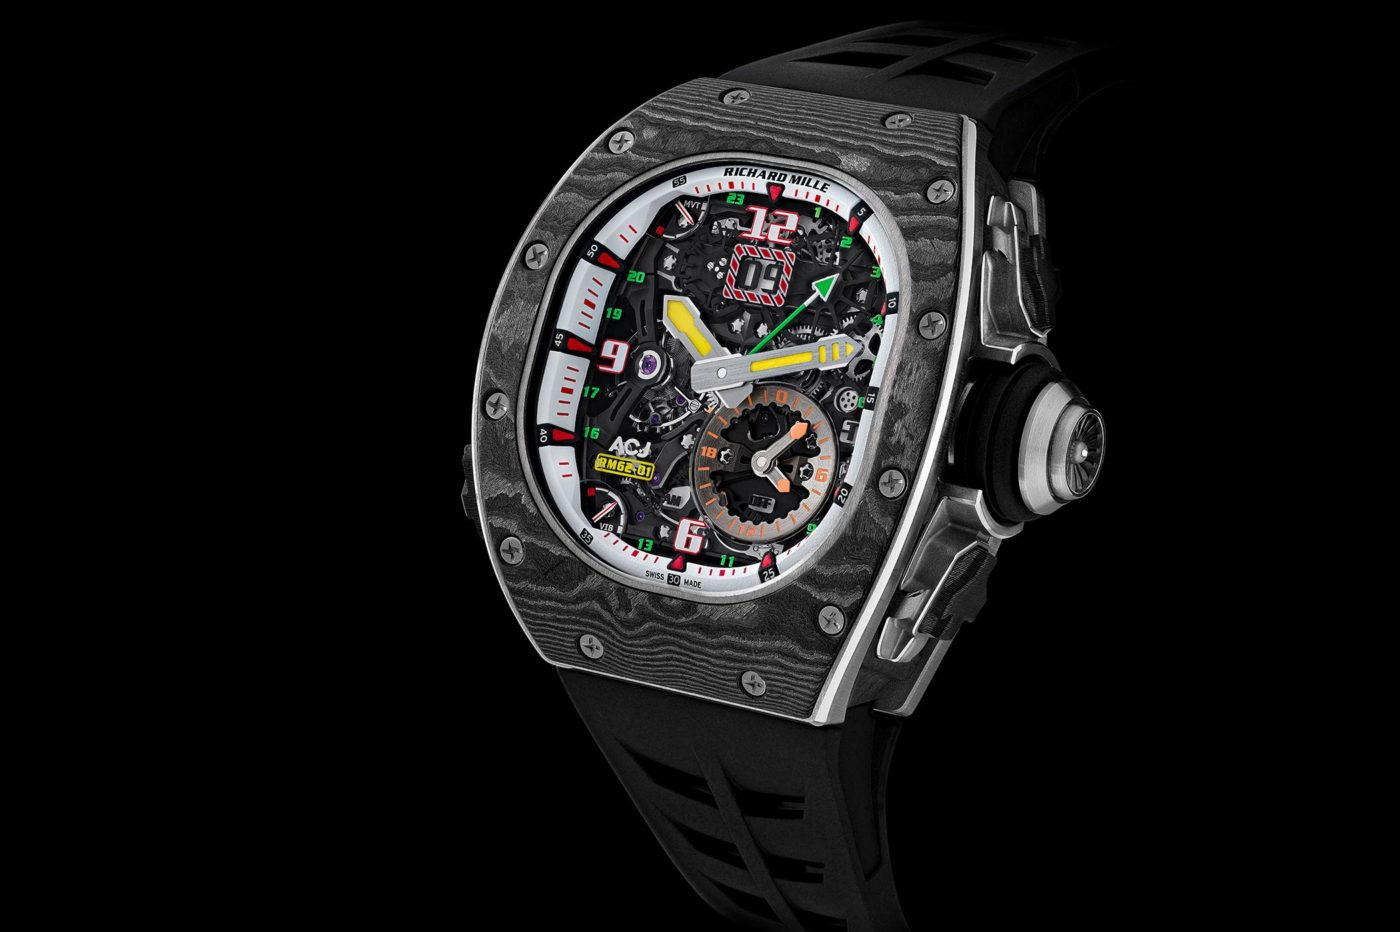 Richard Mille RM 62-01 Tourbillon Vibrating Alarm Airbus Corporate Jets [dostępność, cena]